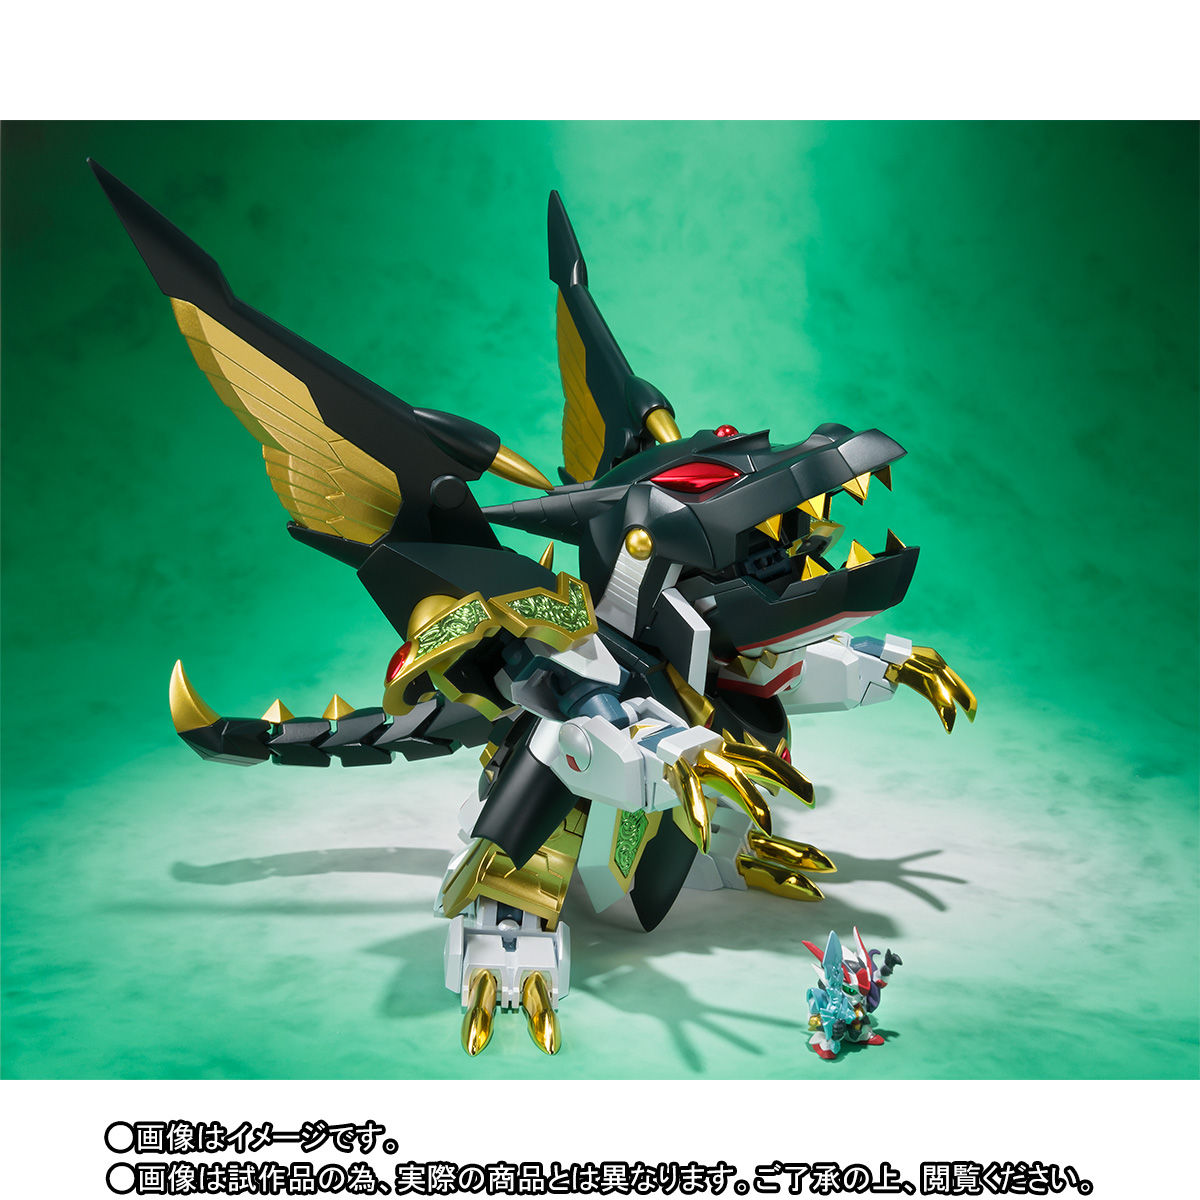 SDX『龍機ドラグーン 新SDガンダム外伝』可変可動フィギュア-007